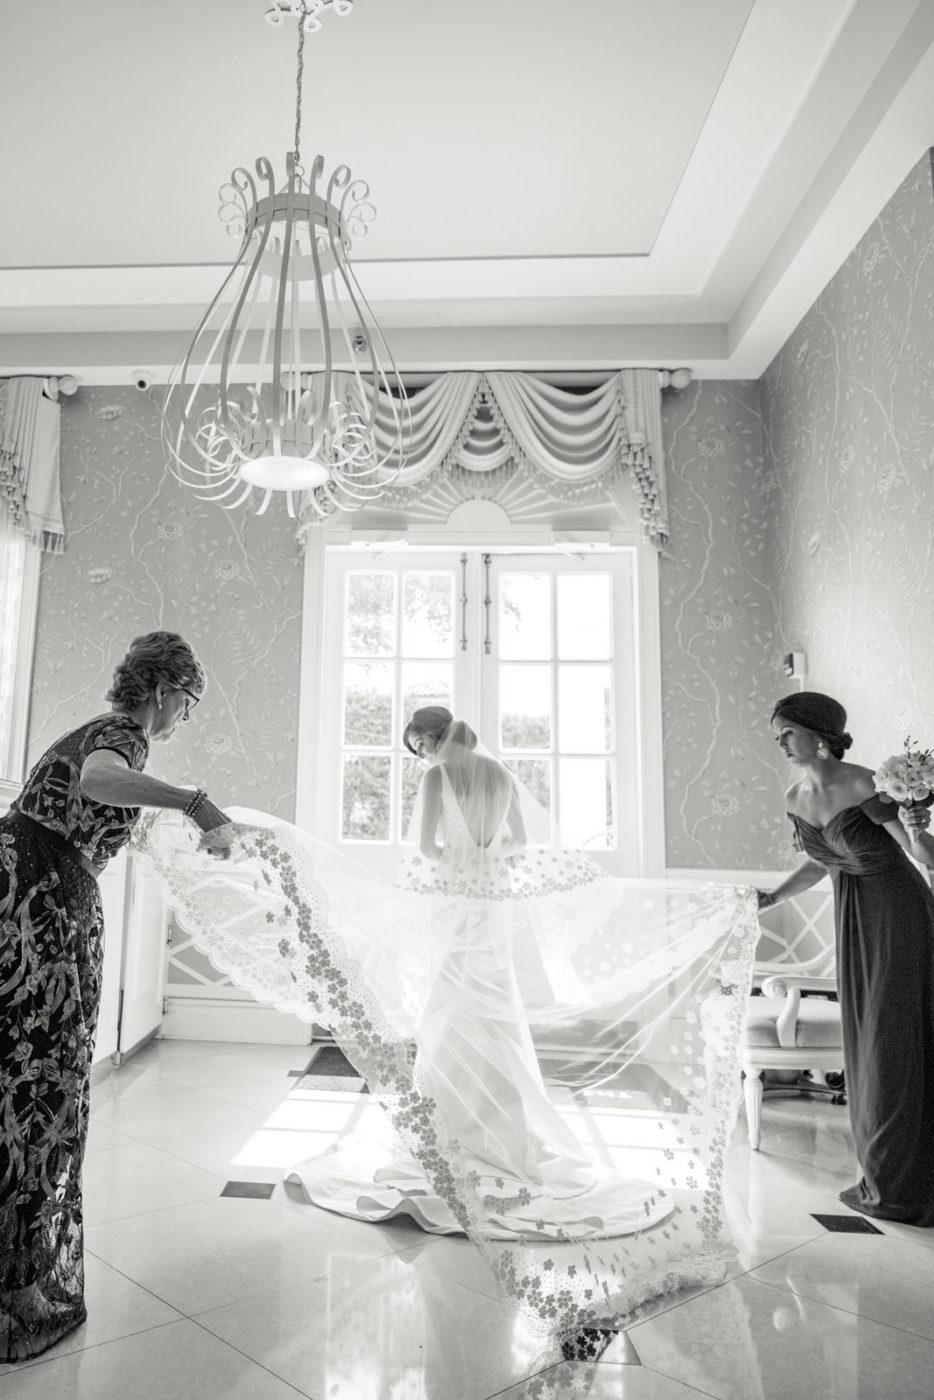 The Colony Hotel Weddings - Sara Kauss Photography